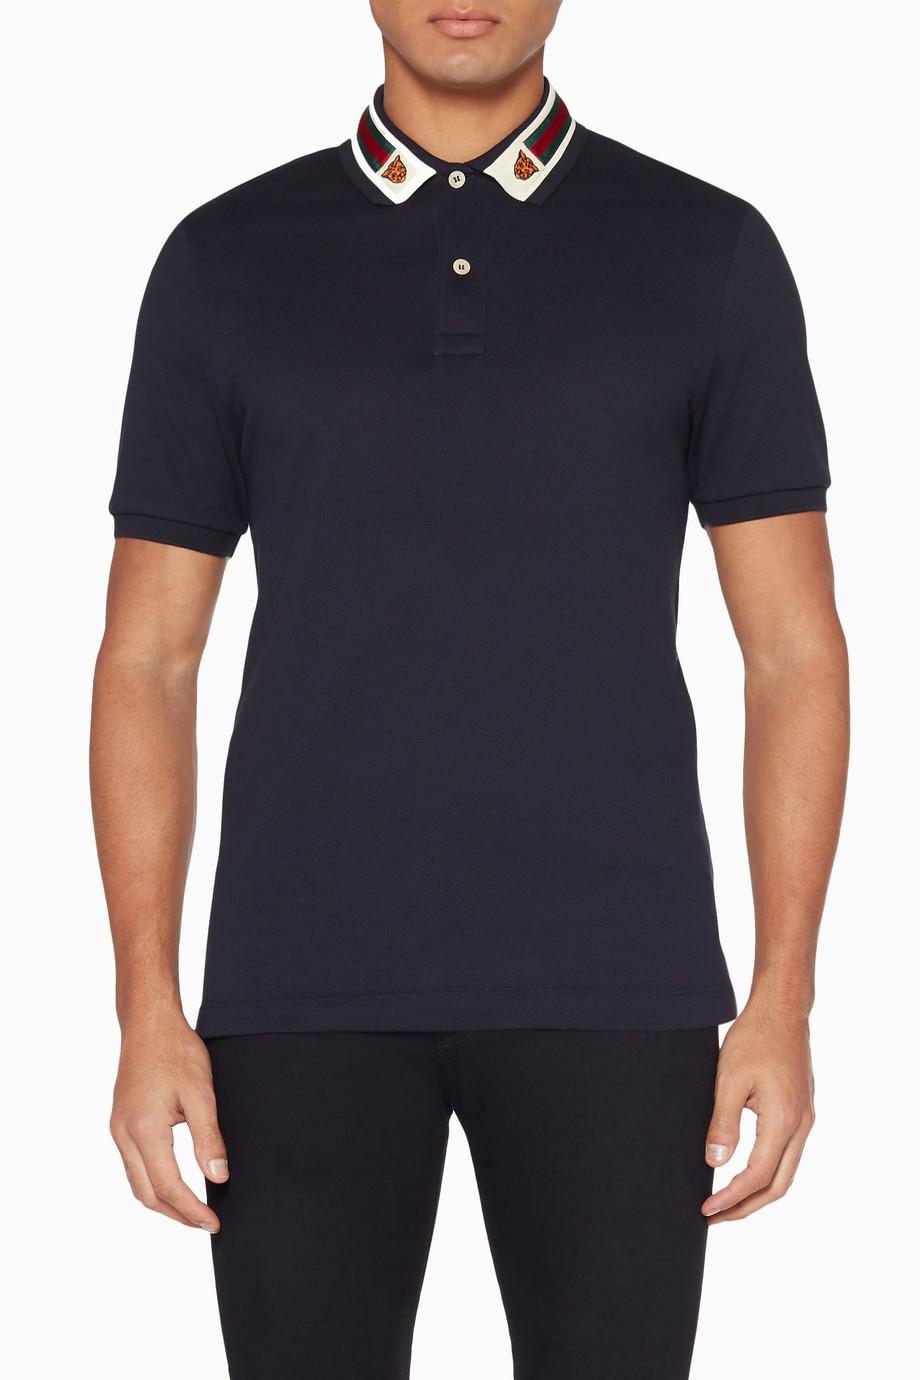 ab31916f45d3 Shop Gucci Blue Dark-Blue Web & Feline Head Polo T-Shirt for Men ...